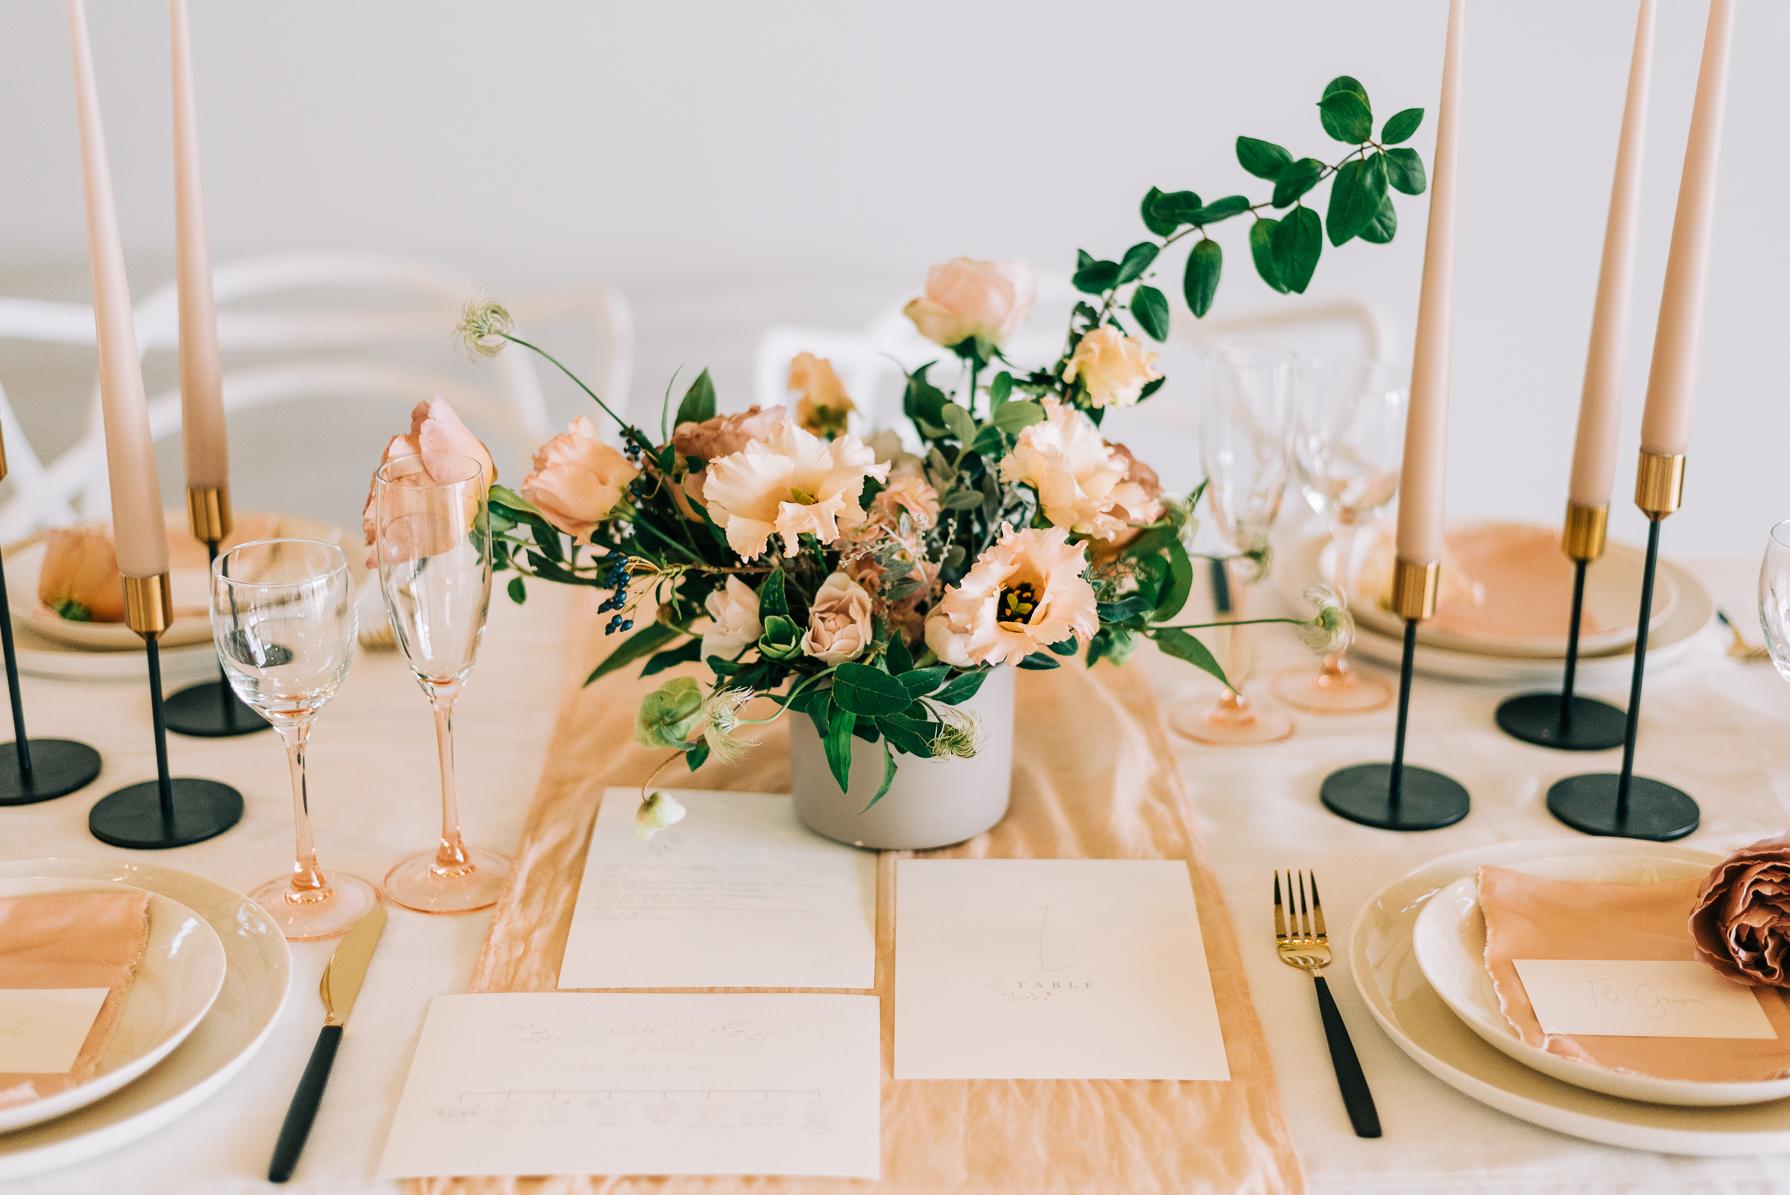 wedding breakfast table setup at casterley barn